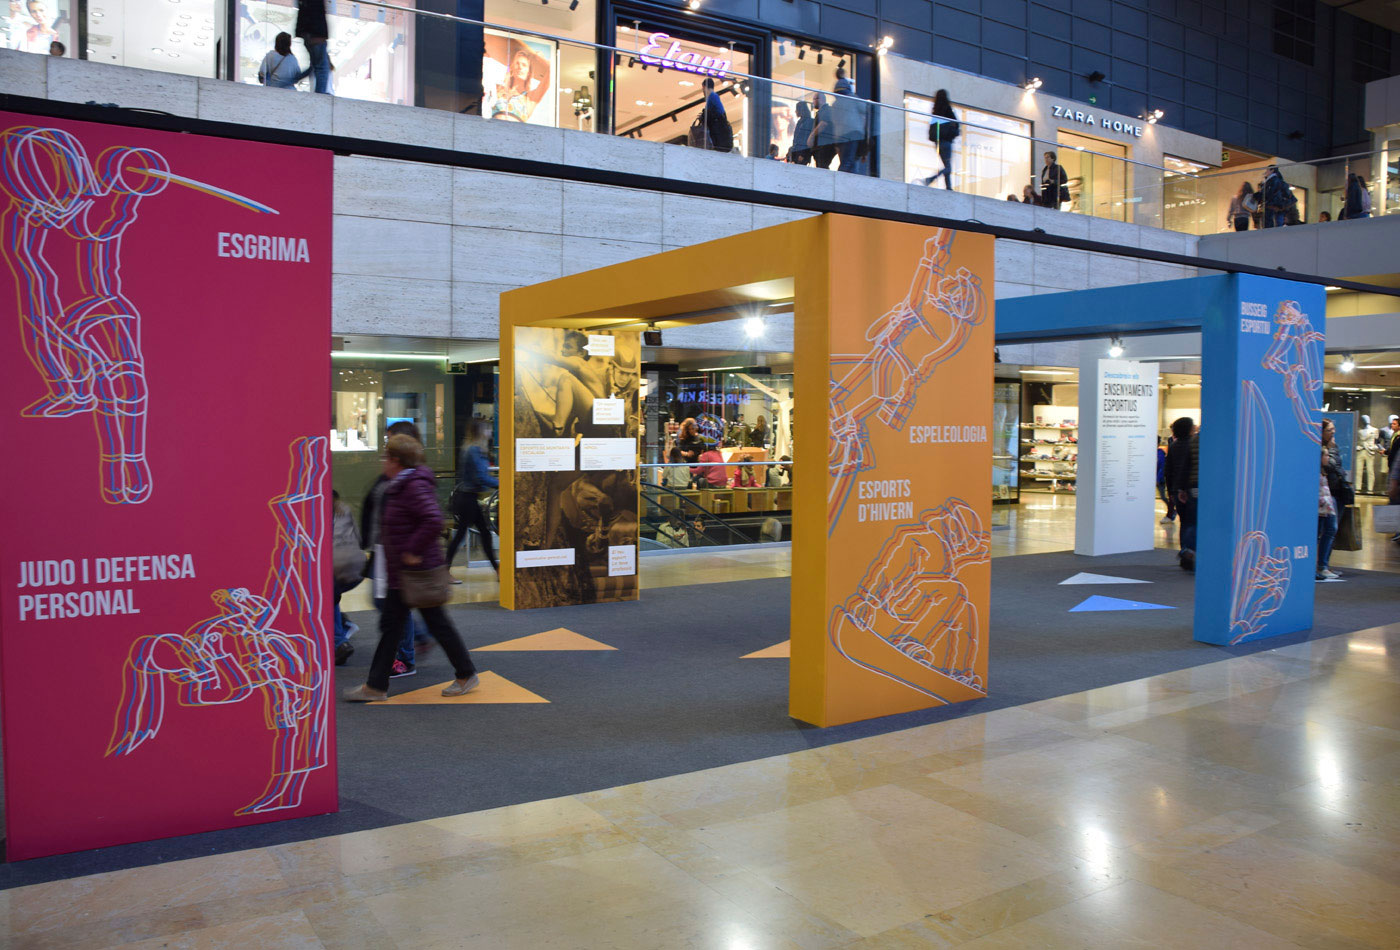 ensenyament-illa-diagonal-esport-generalitat-disseny-creartiva-barcelona-expo